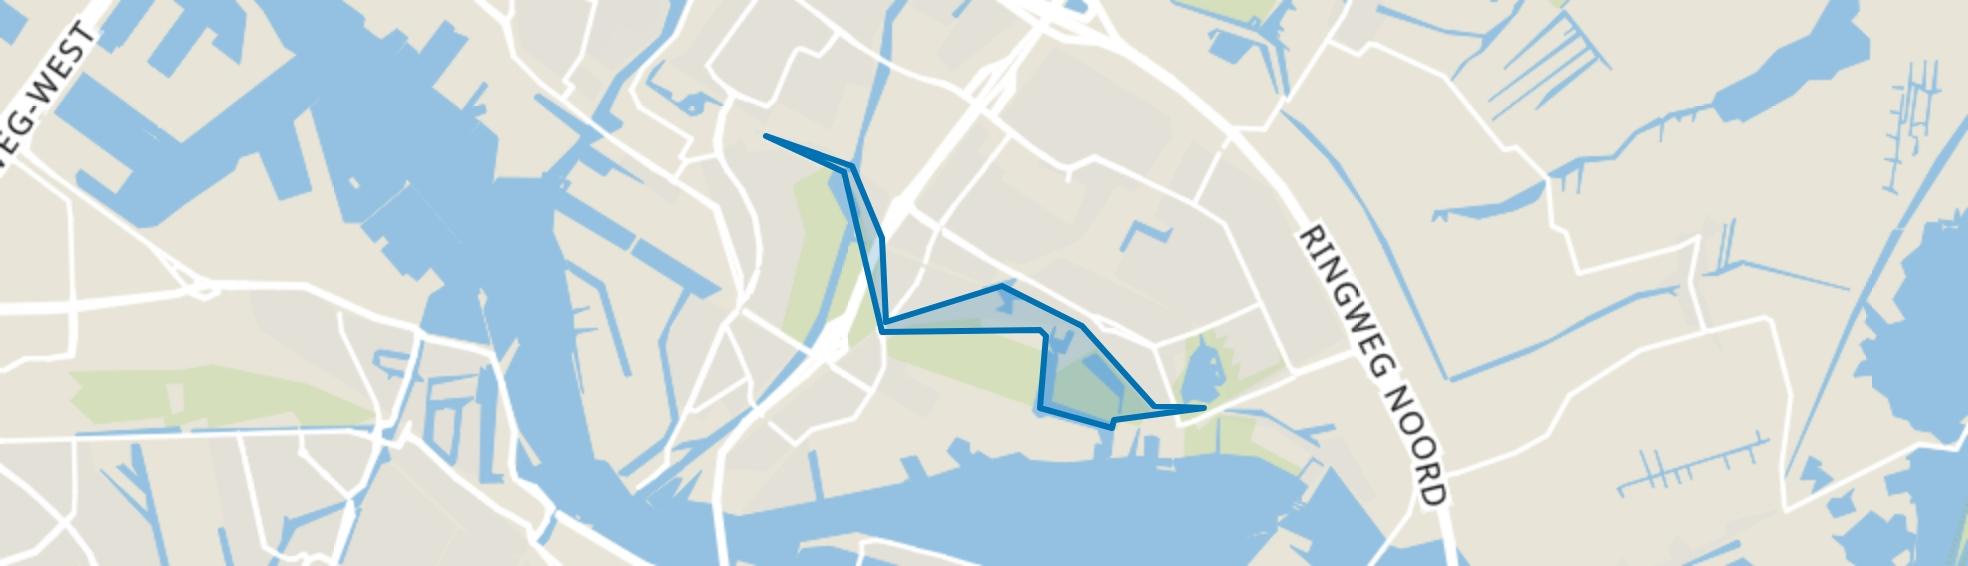 Nieuwendammerdijk/Buiksloterdijk, Amsterdam map